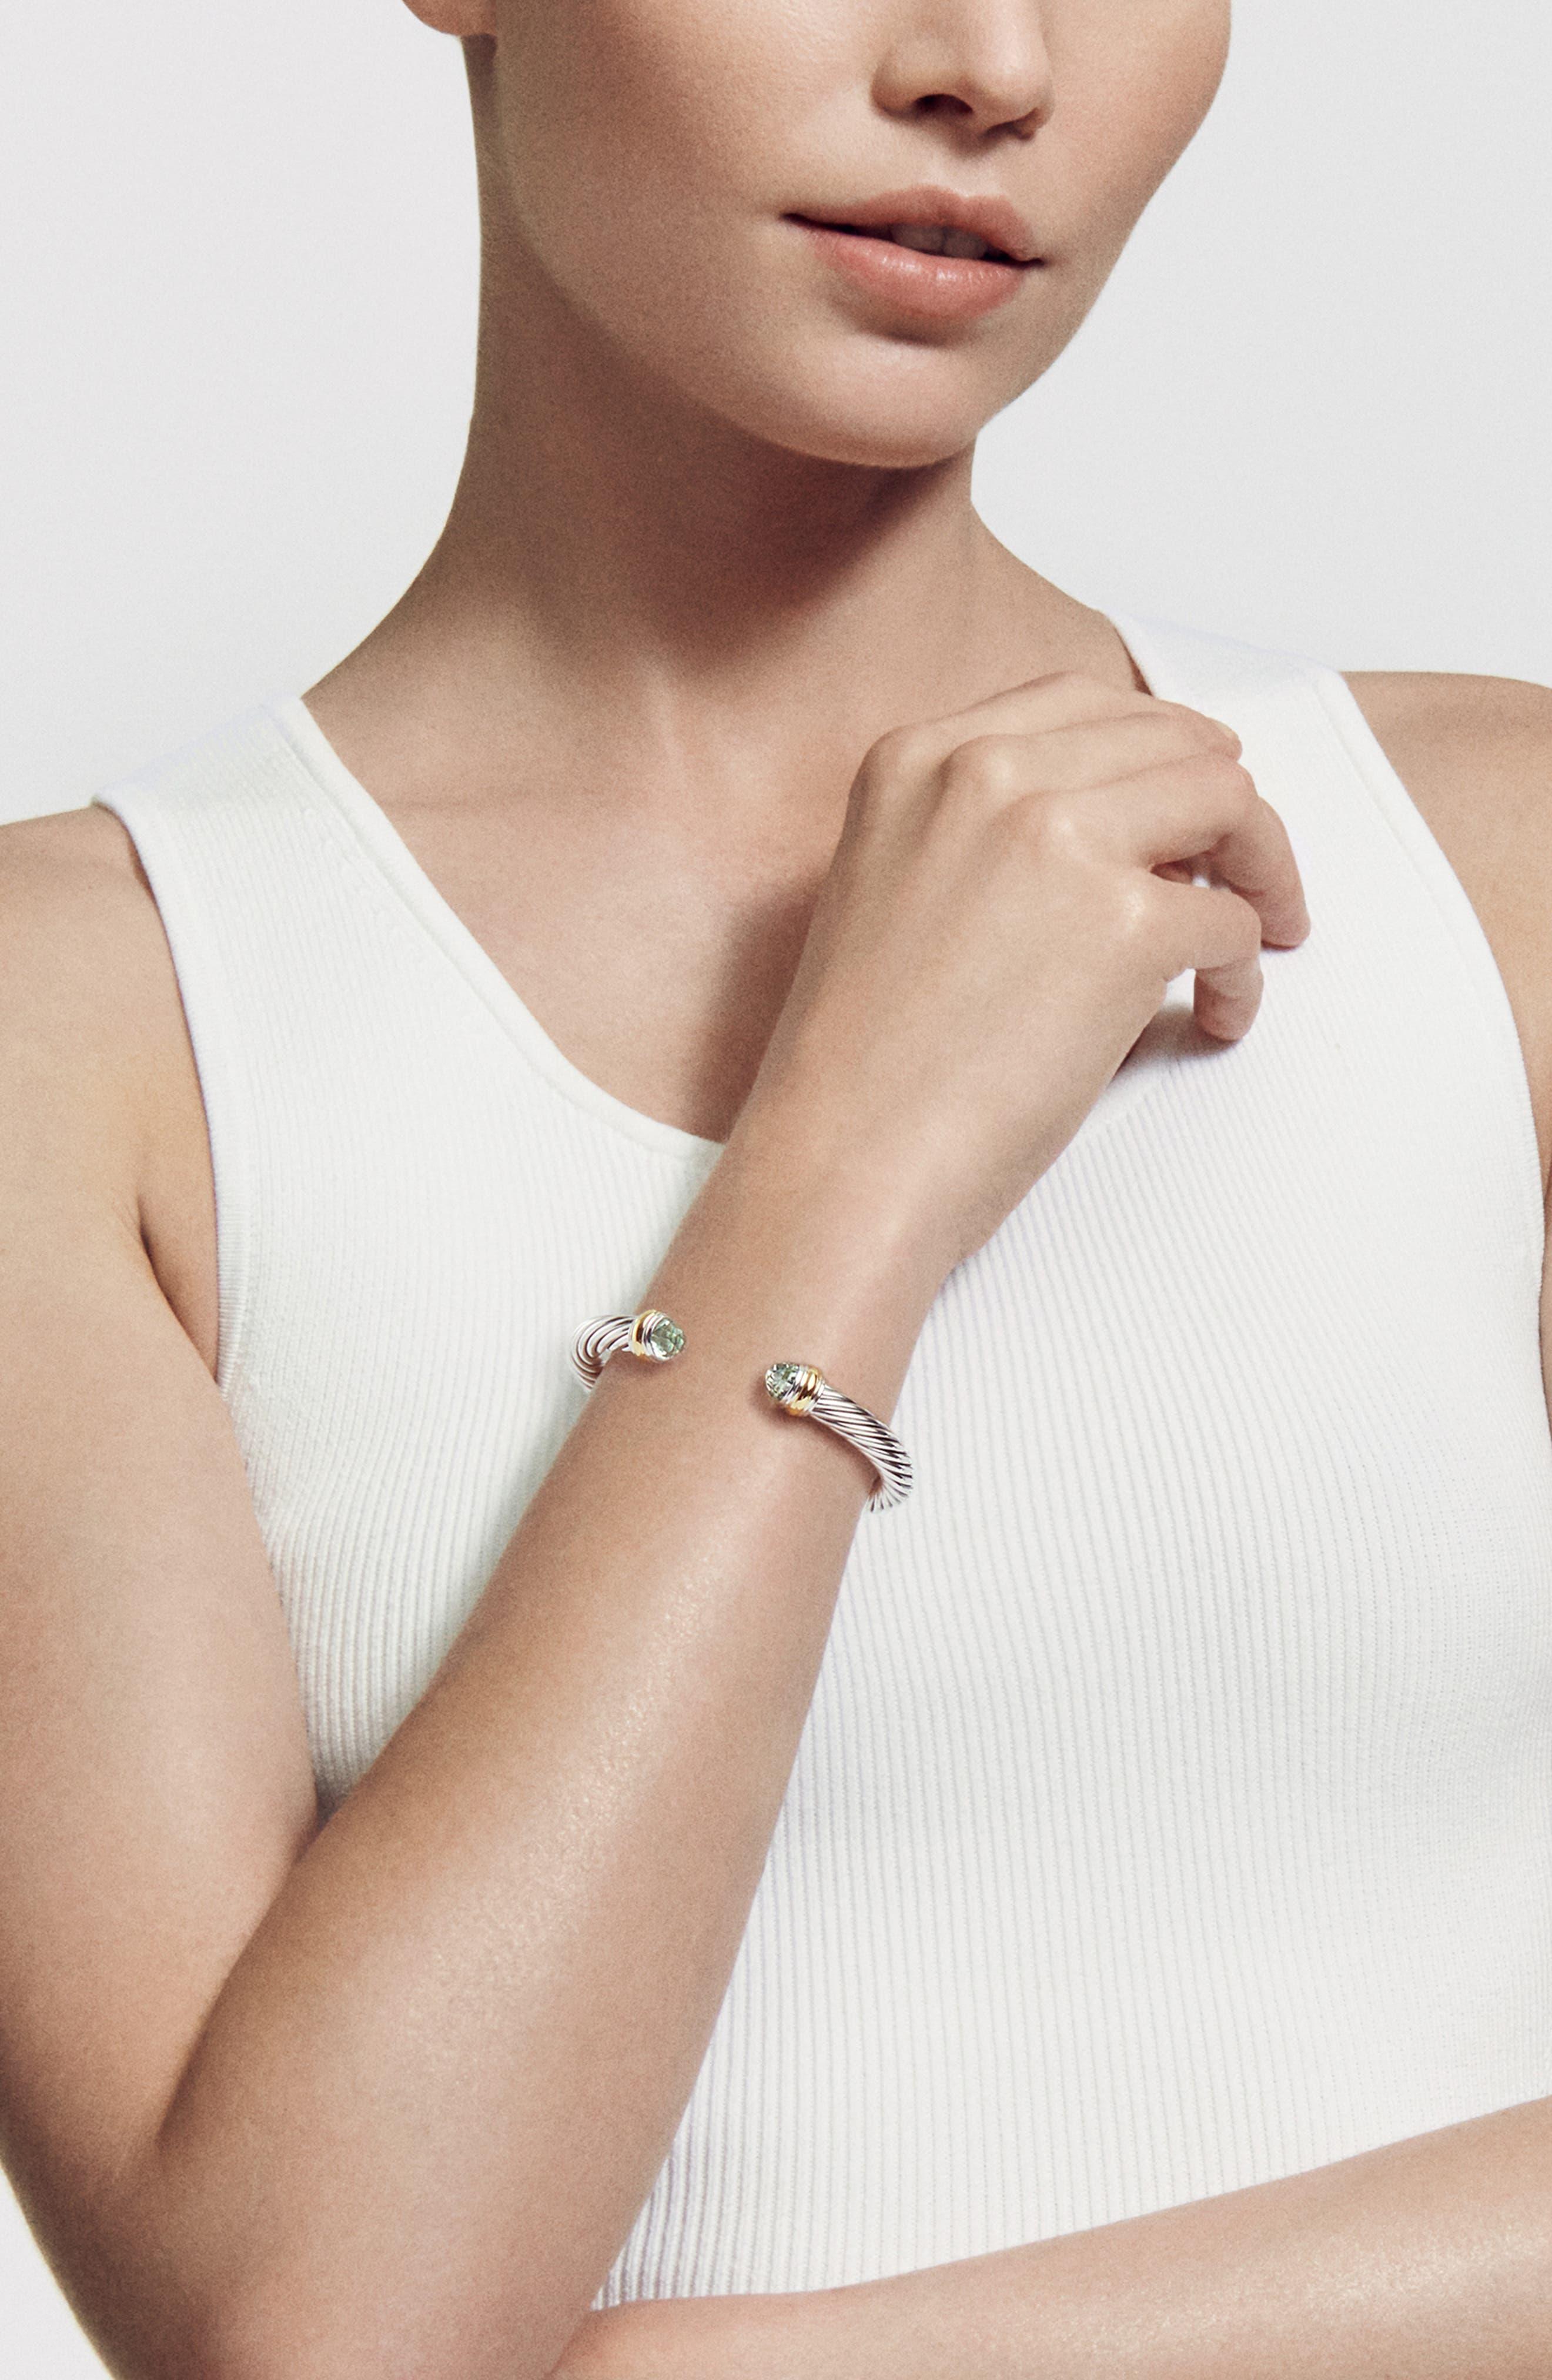 DAVID YURMAN, Cable Classics Bracelet with Semiprecious Stones & 14K Gold, 7mm, Alternate thumbnail 2, color, PRASIOLITE